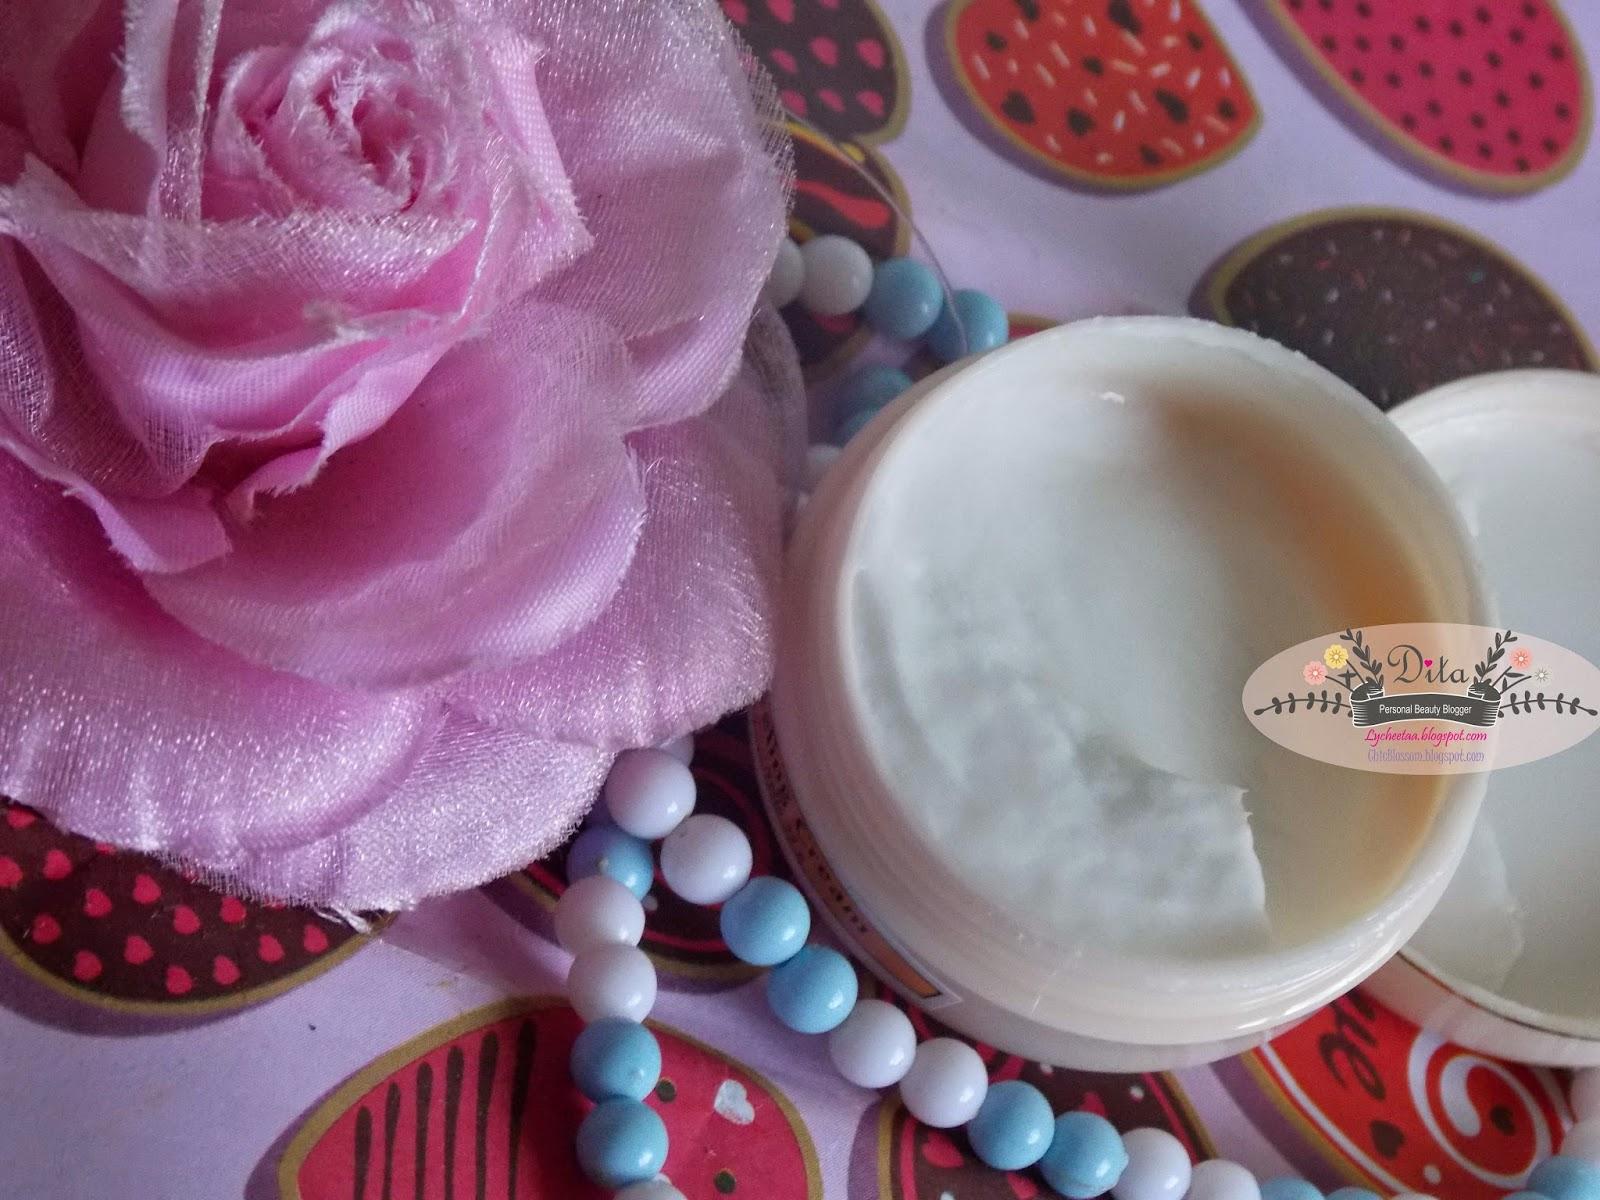 Chic Blossom Review Viva Queen Peeling Cream